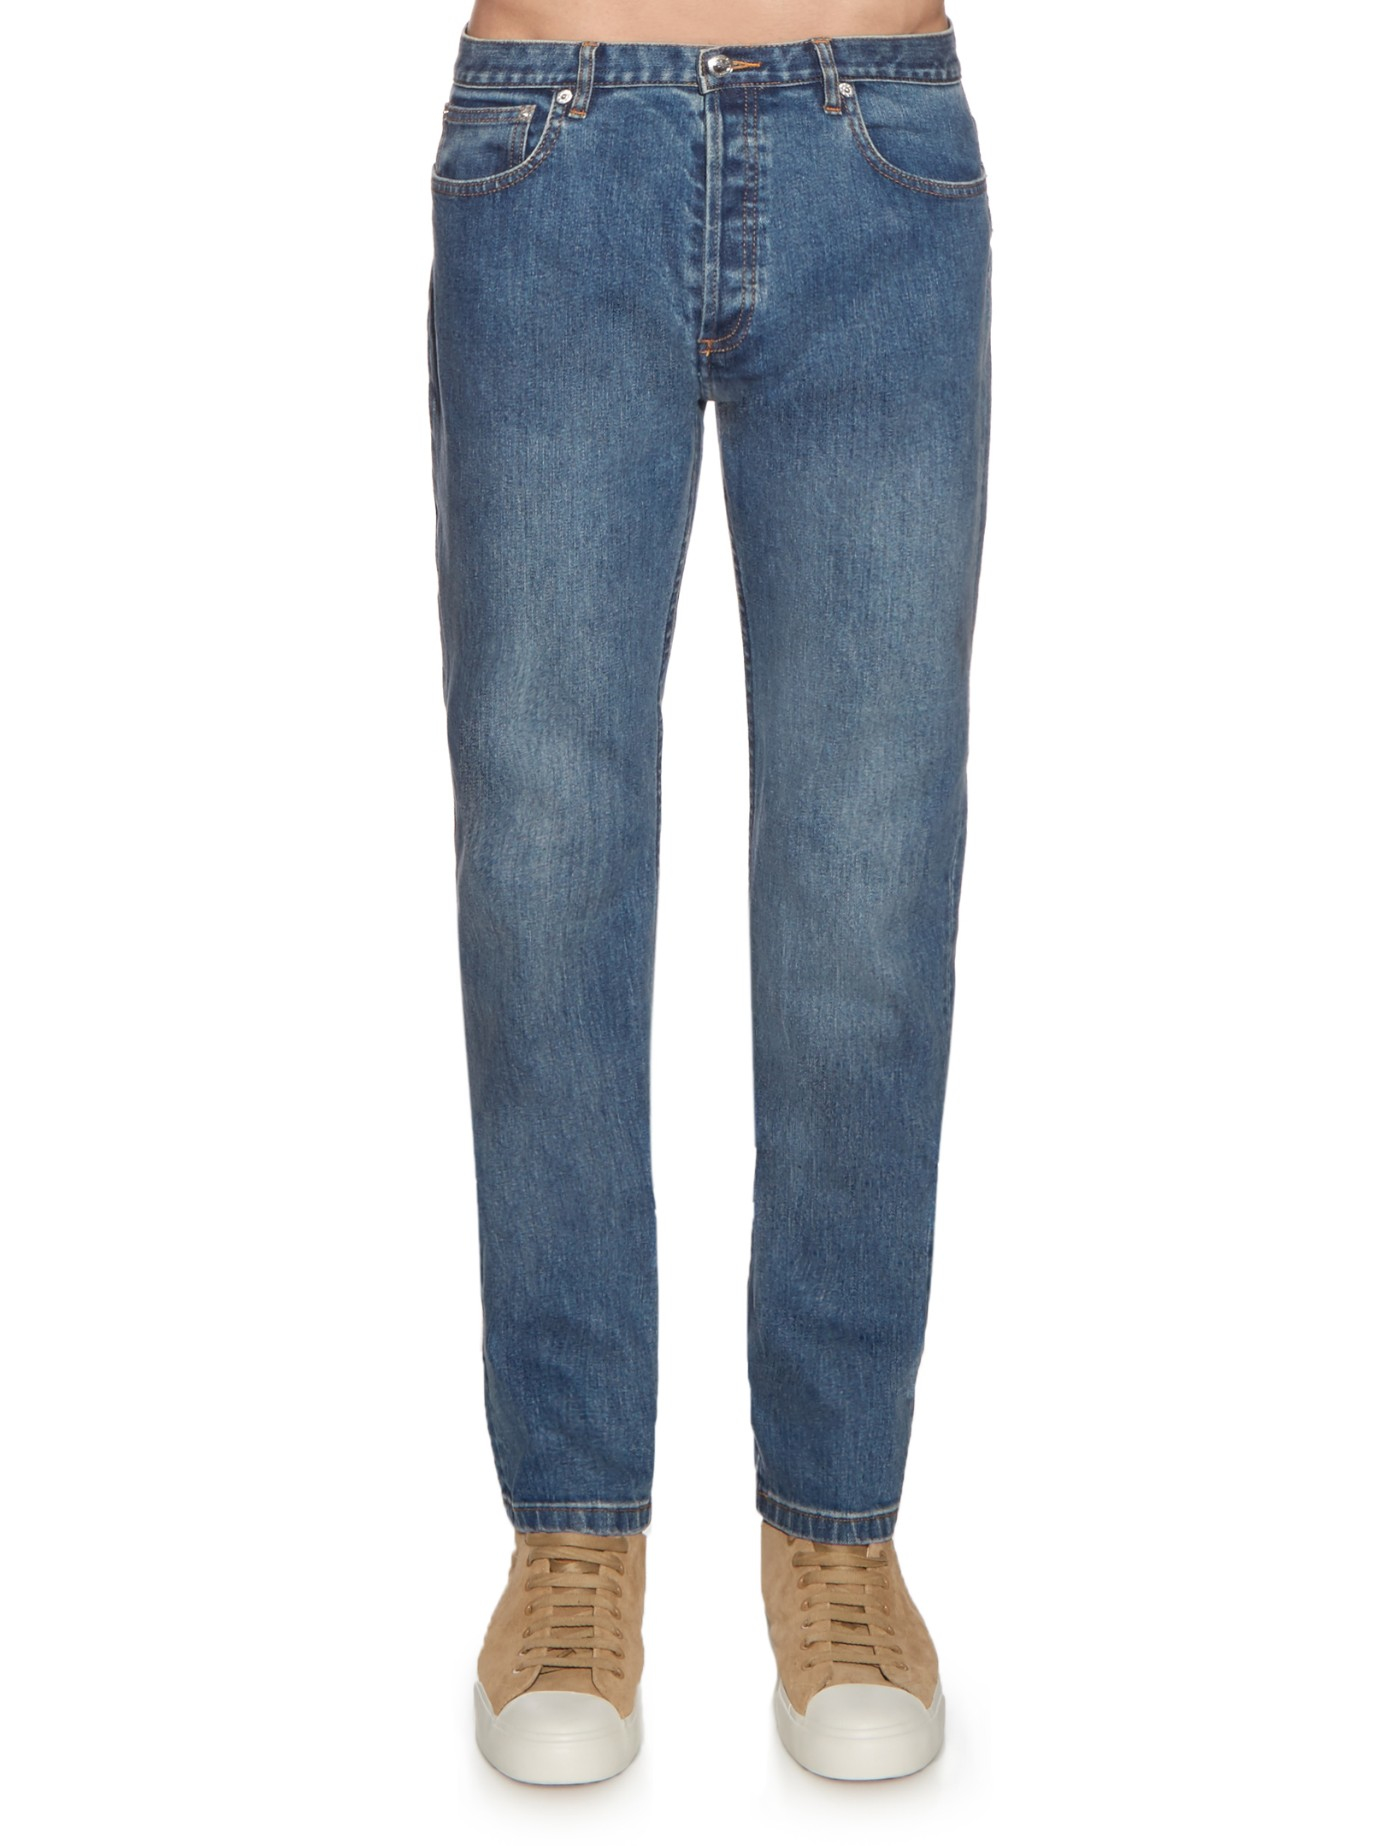 a p c petit new standard slim fit jeans in blue for men lyst. Black Bedroom Furniture Sets. Home Design Ideas